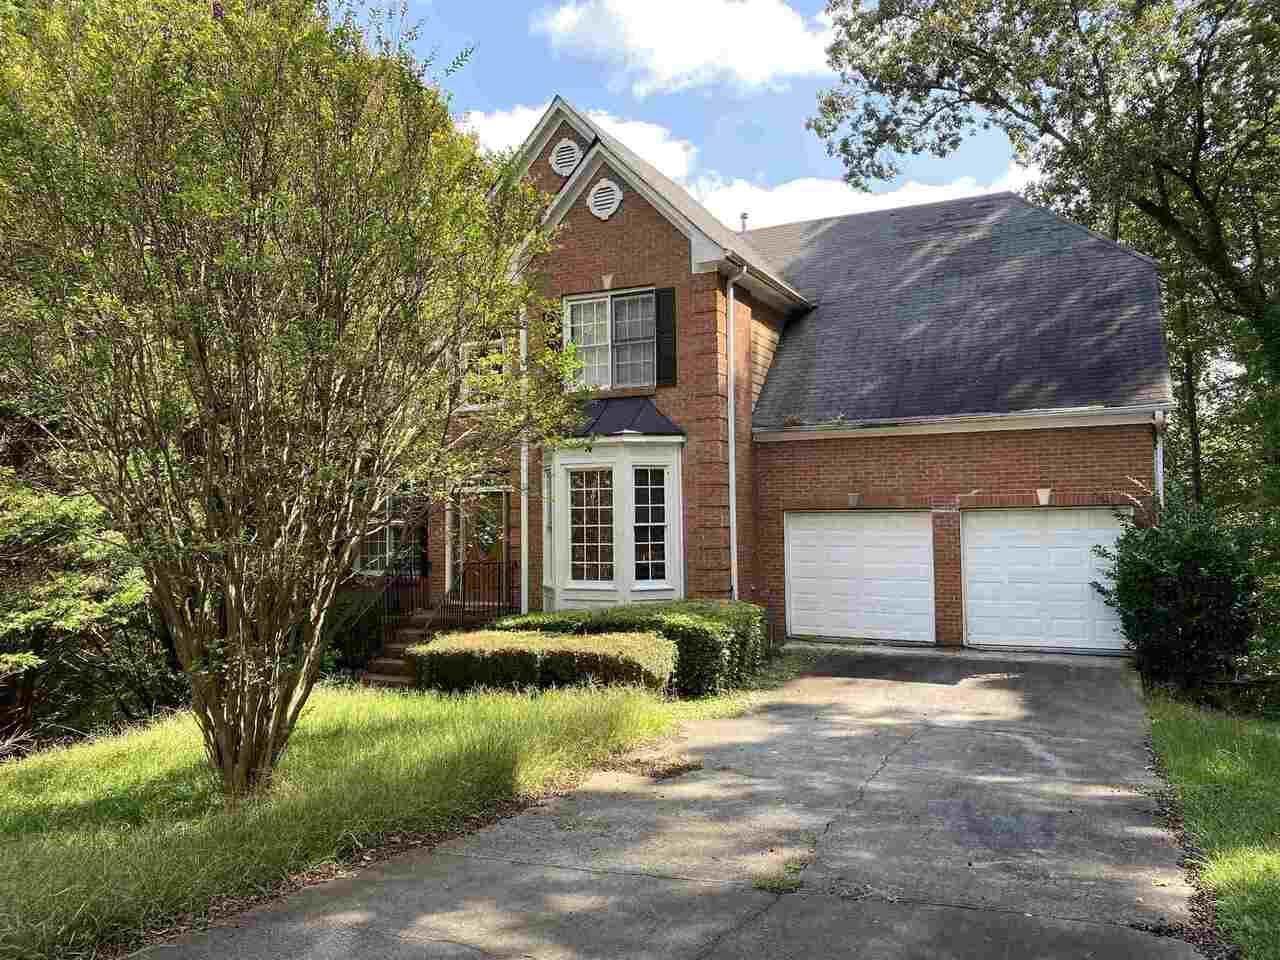 4865 Montcalm Dr, Atlanta, GA 30331 - MLS#: 8872295